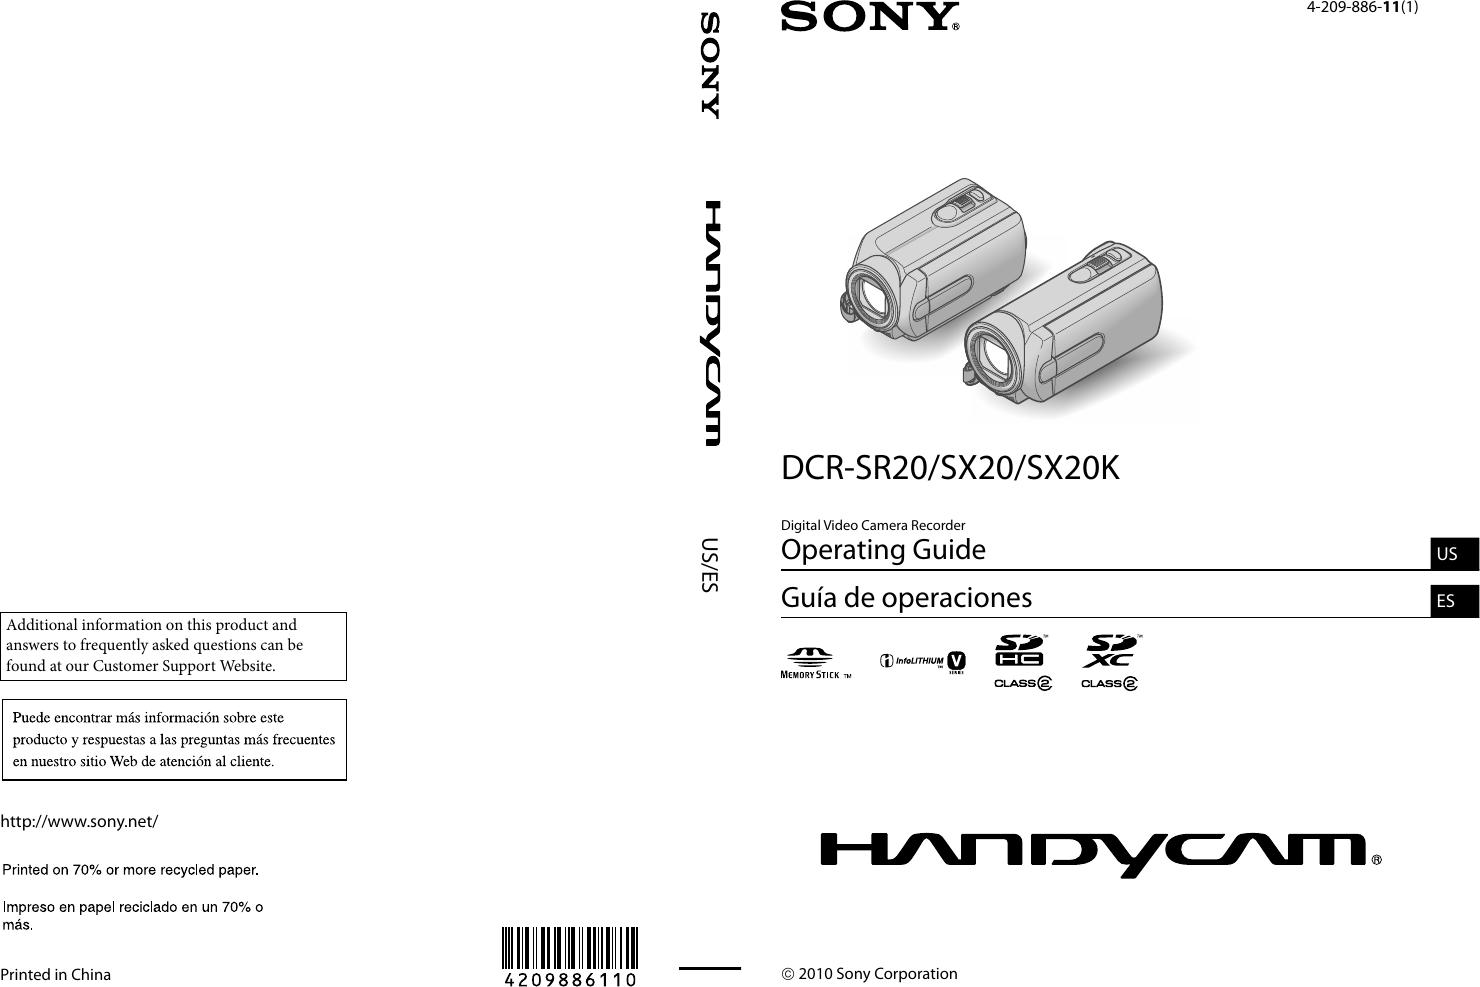 Sony Handycam Dcr Sr20 Users Manual SR20/SX20/SX20K